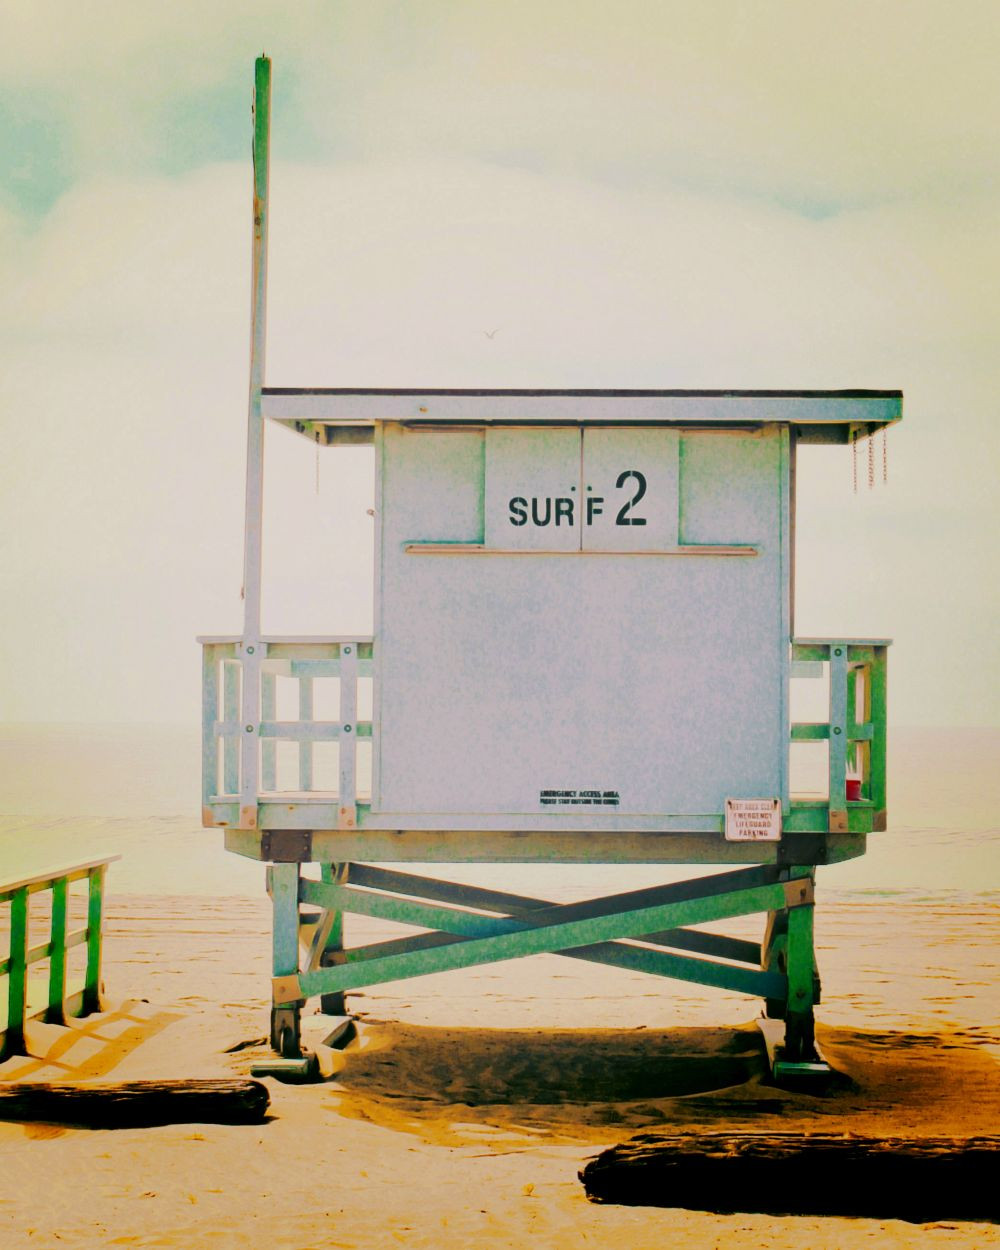 Surf2 - Urban Natural Designs handcrafted artwork